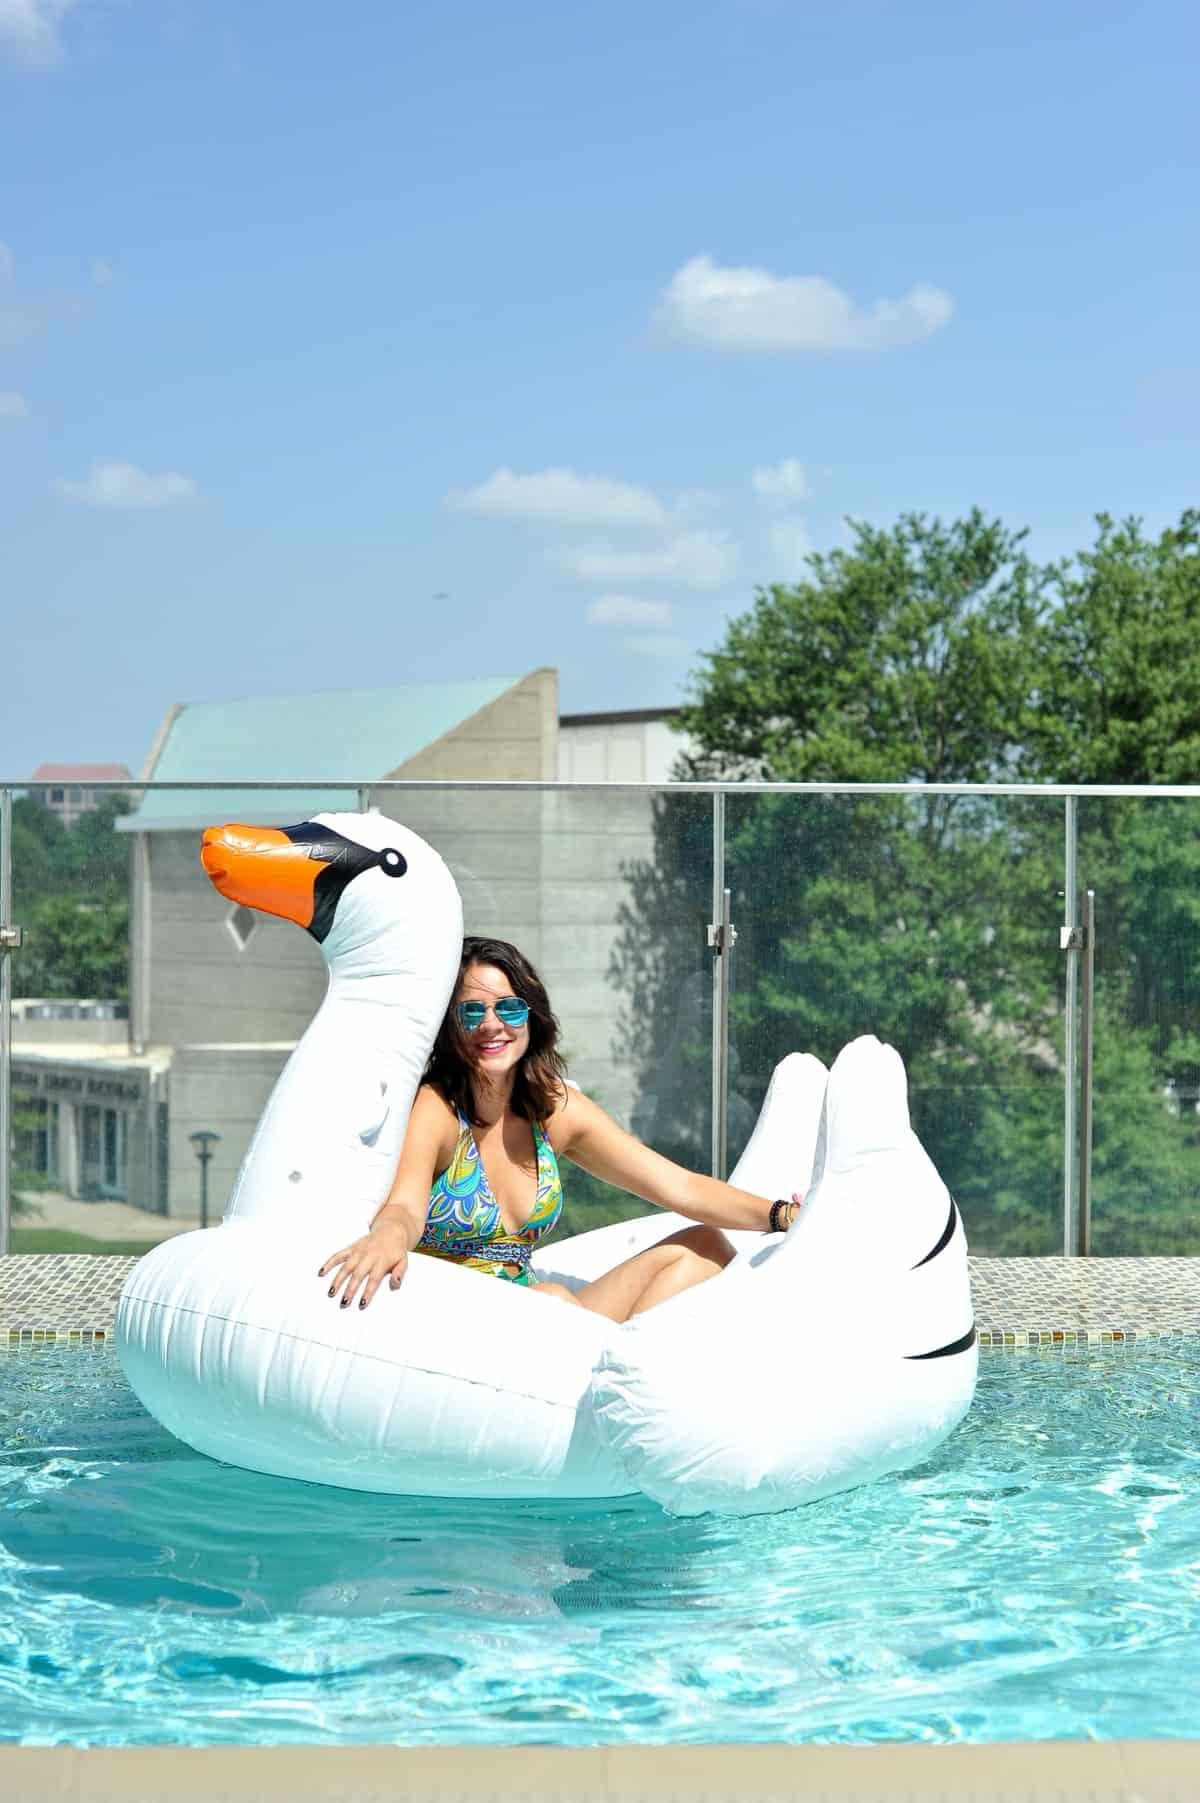 adult pool party ideas, swan pool float, flamingo inflatable drink holder via @mystylevita - 32